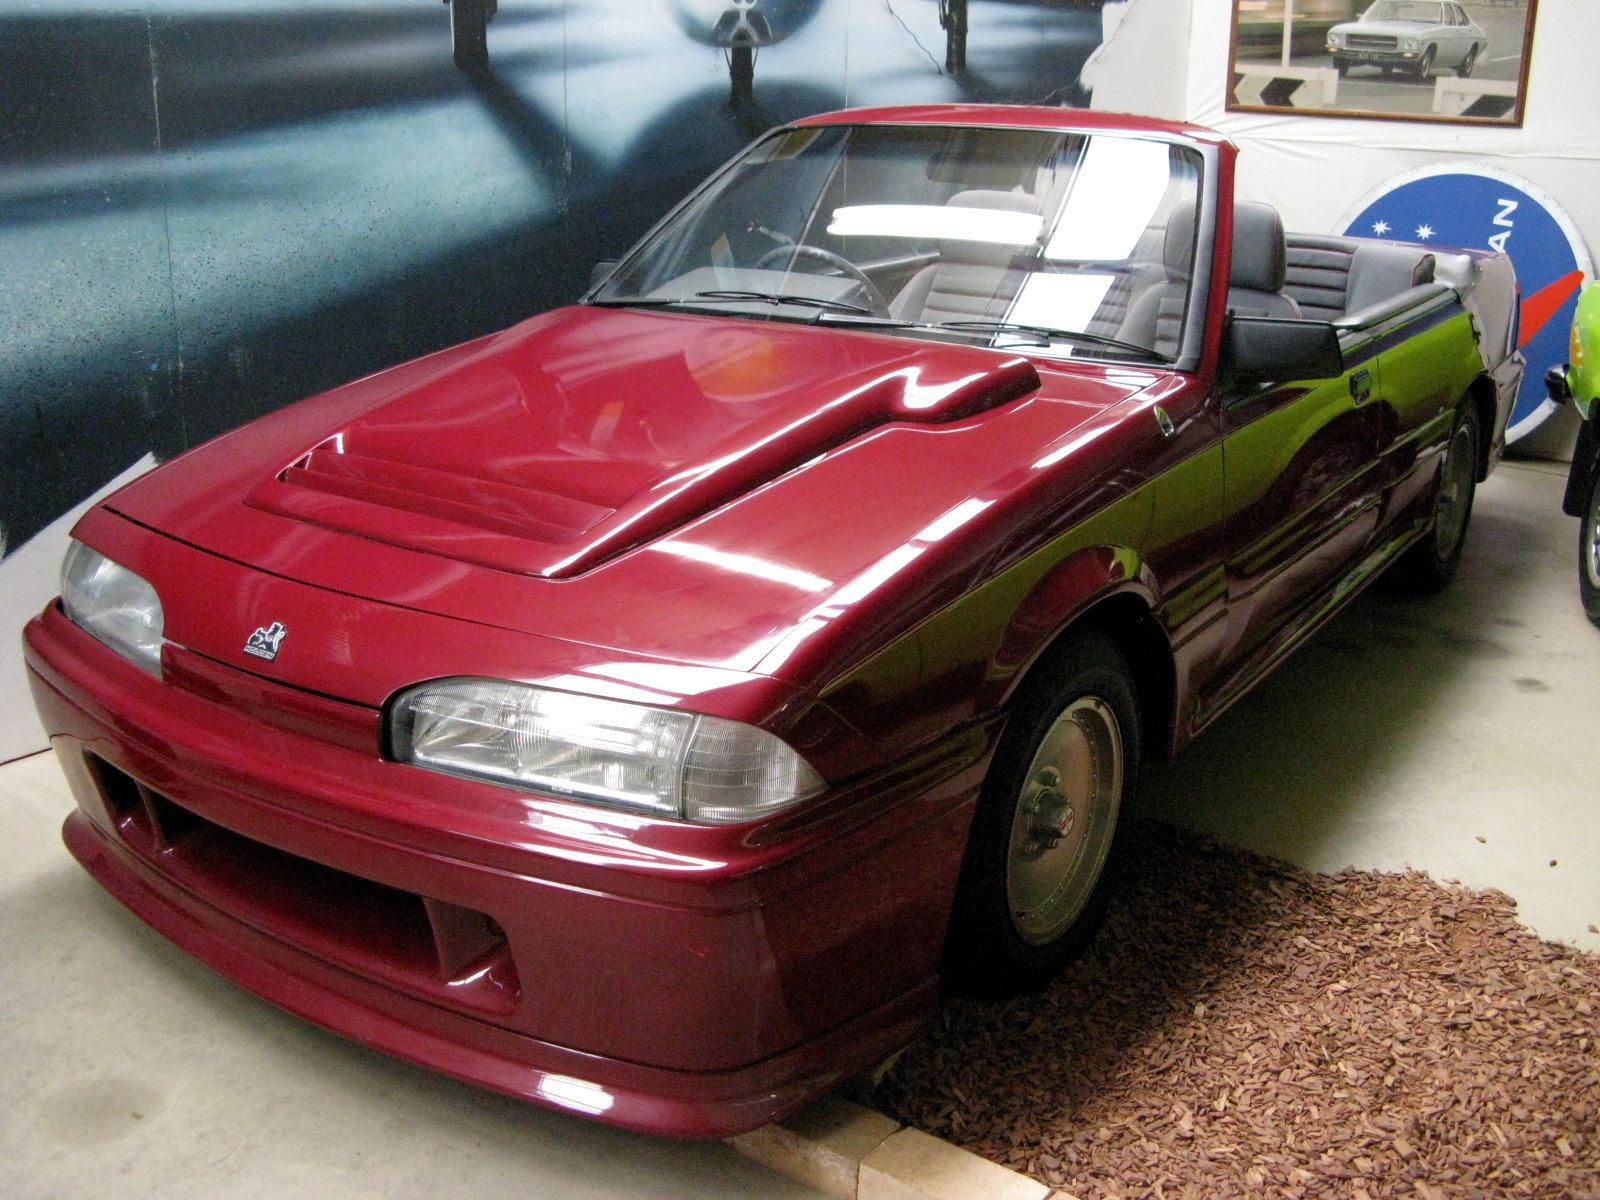 Convertible Commodore For Sale 16 000